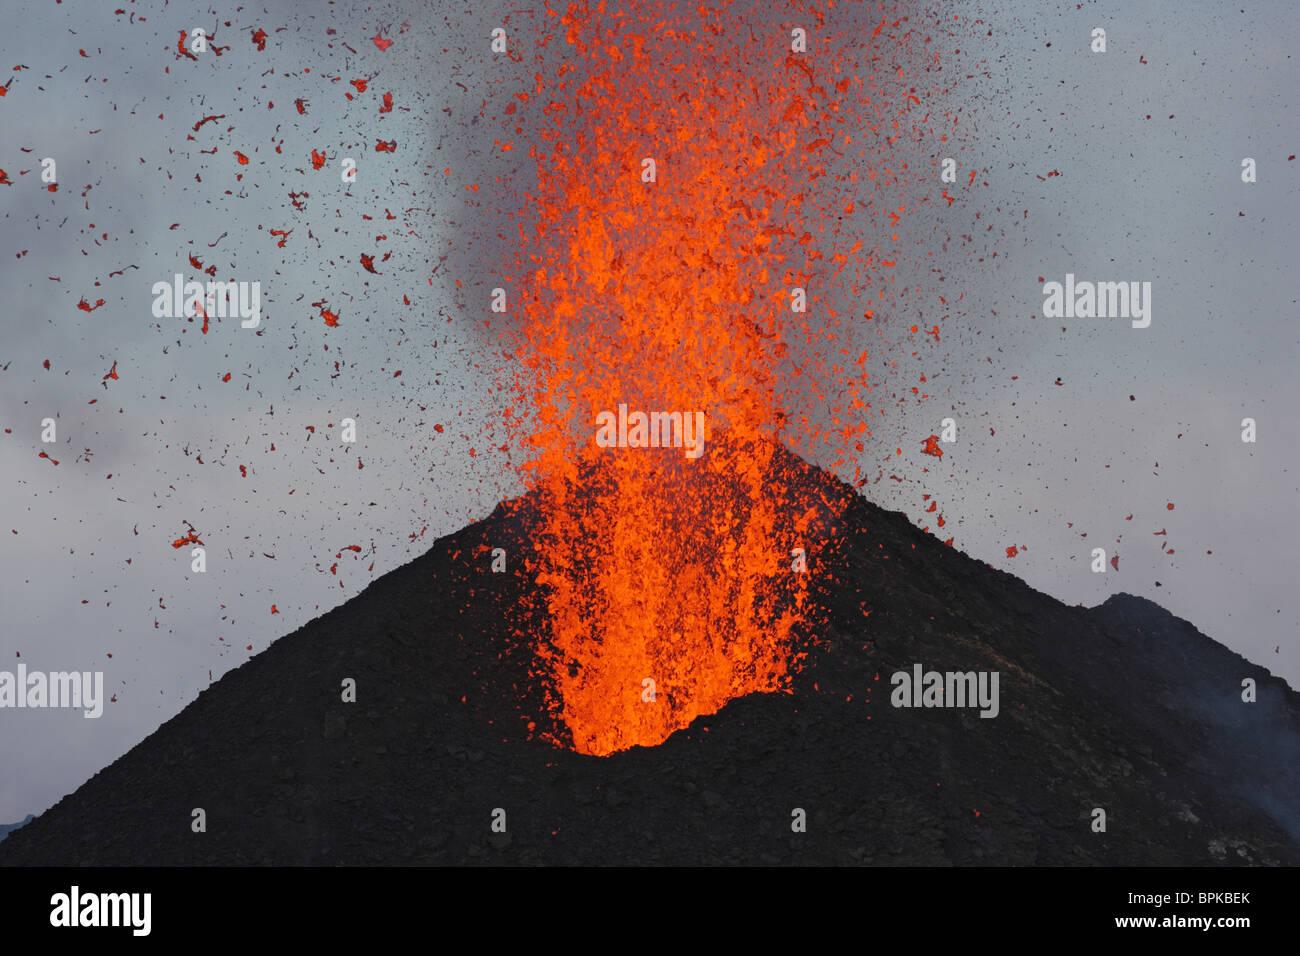 May 10, 2009 - Stromboli eruption, Aeolian Islands, north of Sicily, Italy. - Stock Image